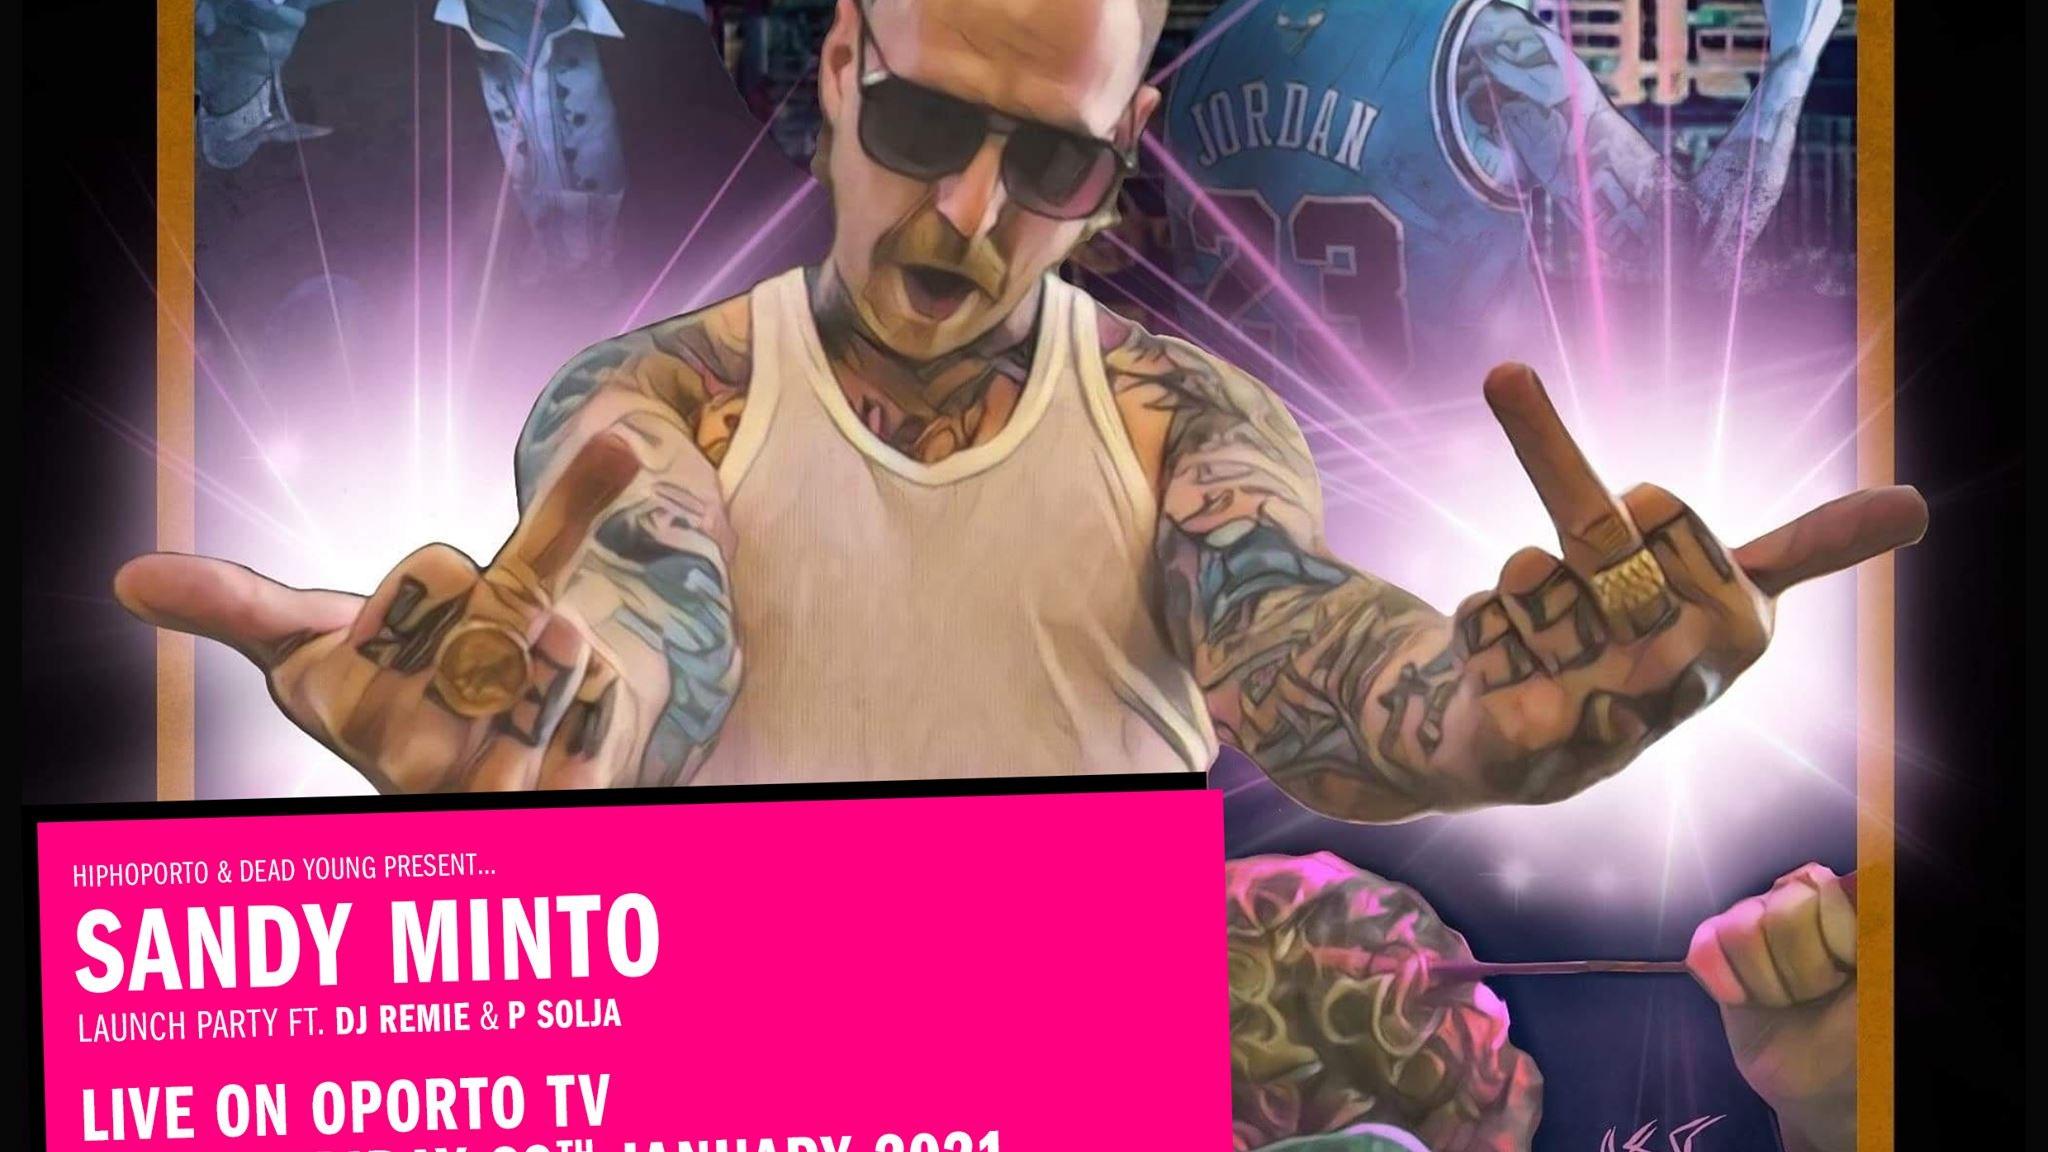 Sandy Minto Hiphoporto show on #OportoTV for Independent Venue Week